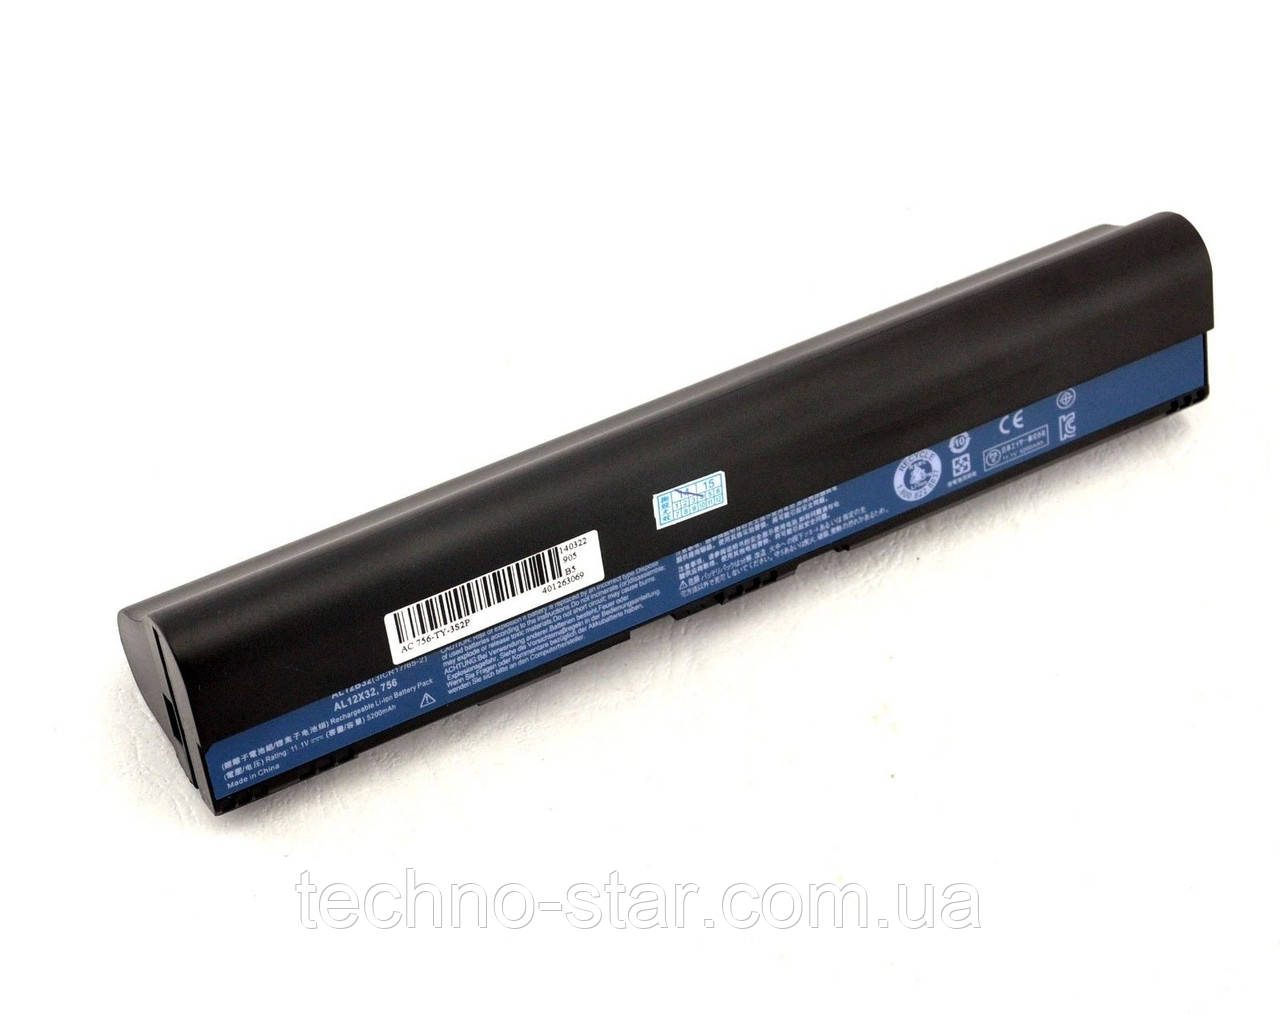 Акумулятор (батарея) ACER AL12X32 AL12A31 AL12B31 AL12B32 One 725 756 TravelMate B113 B113M C710 C7